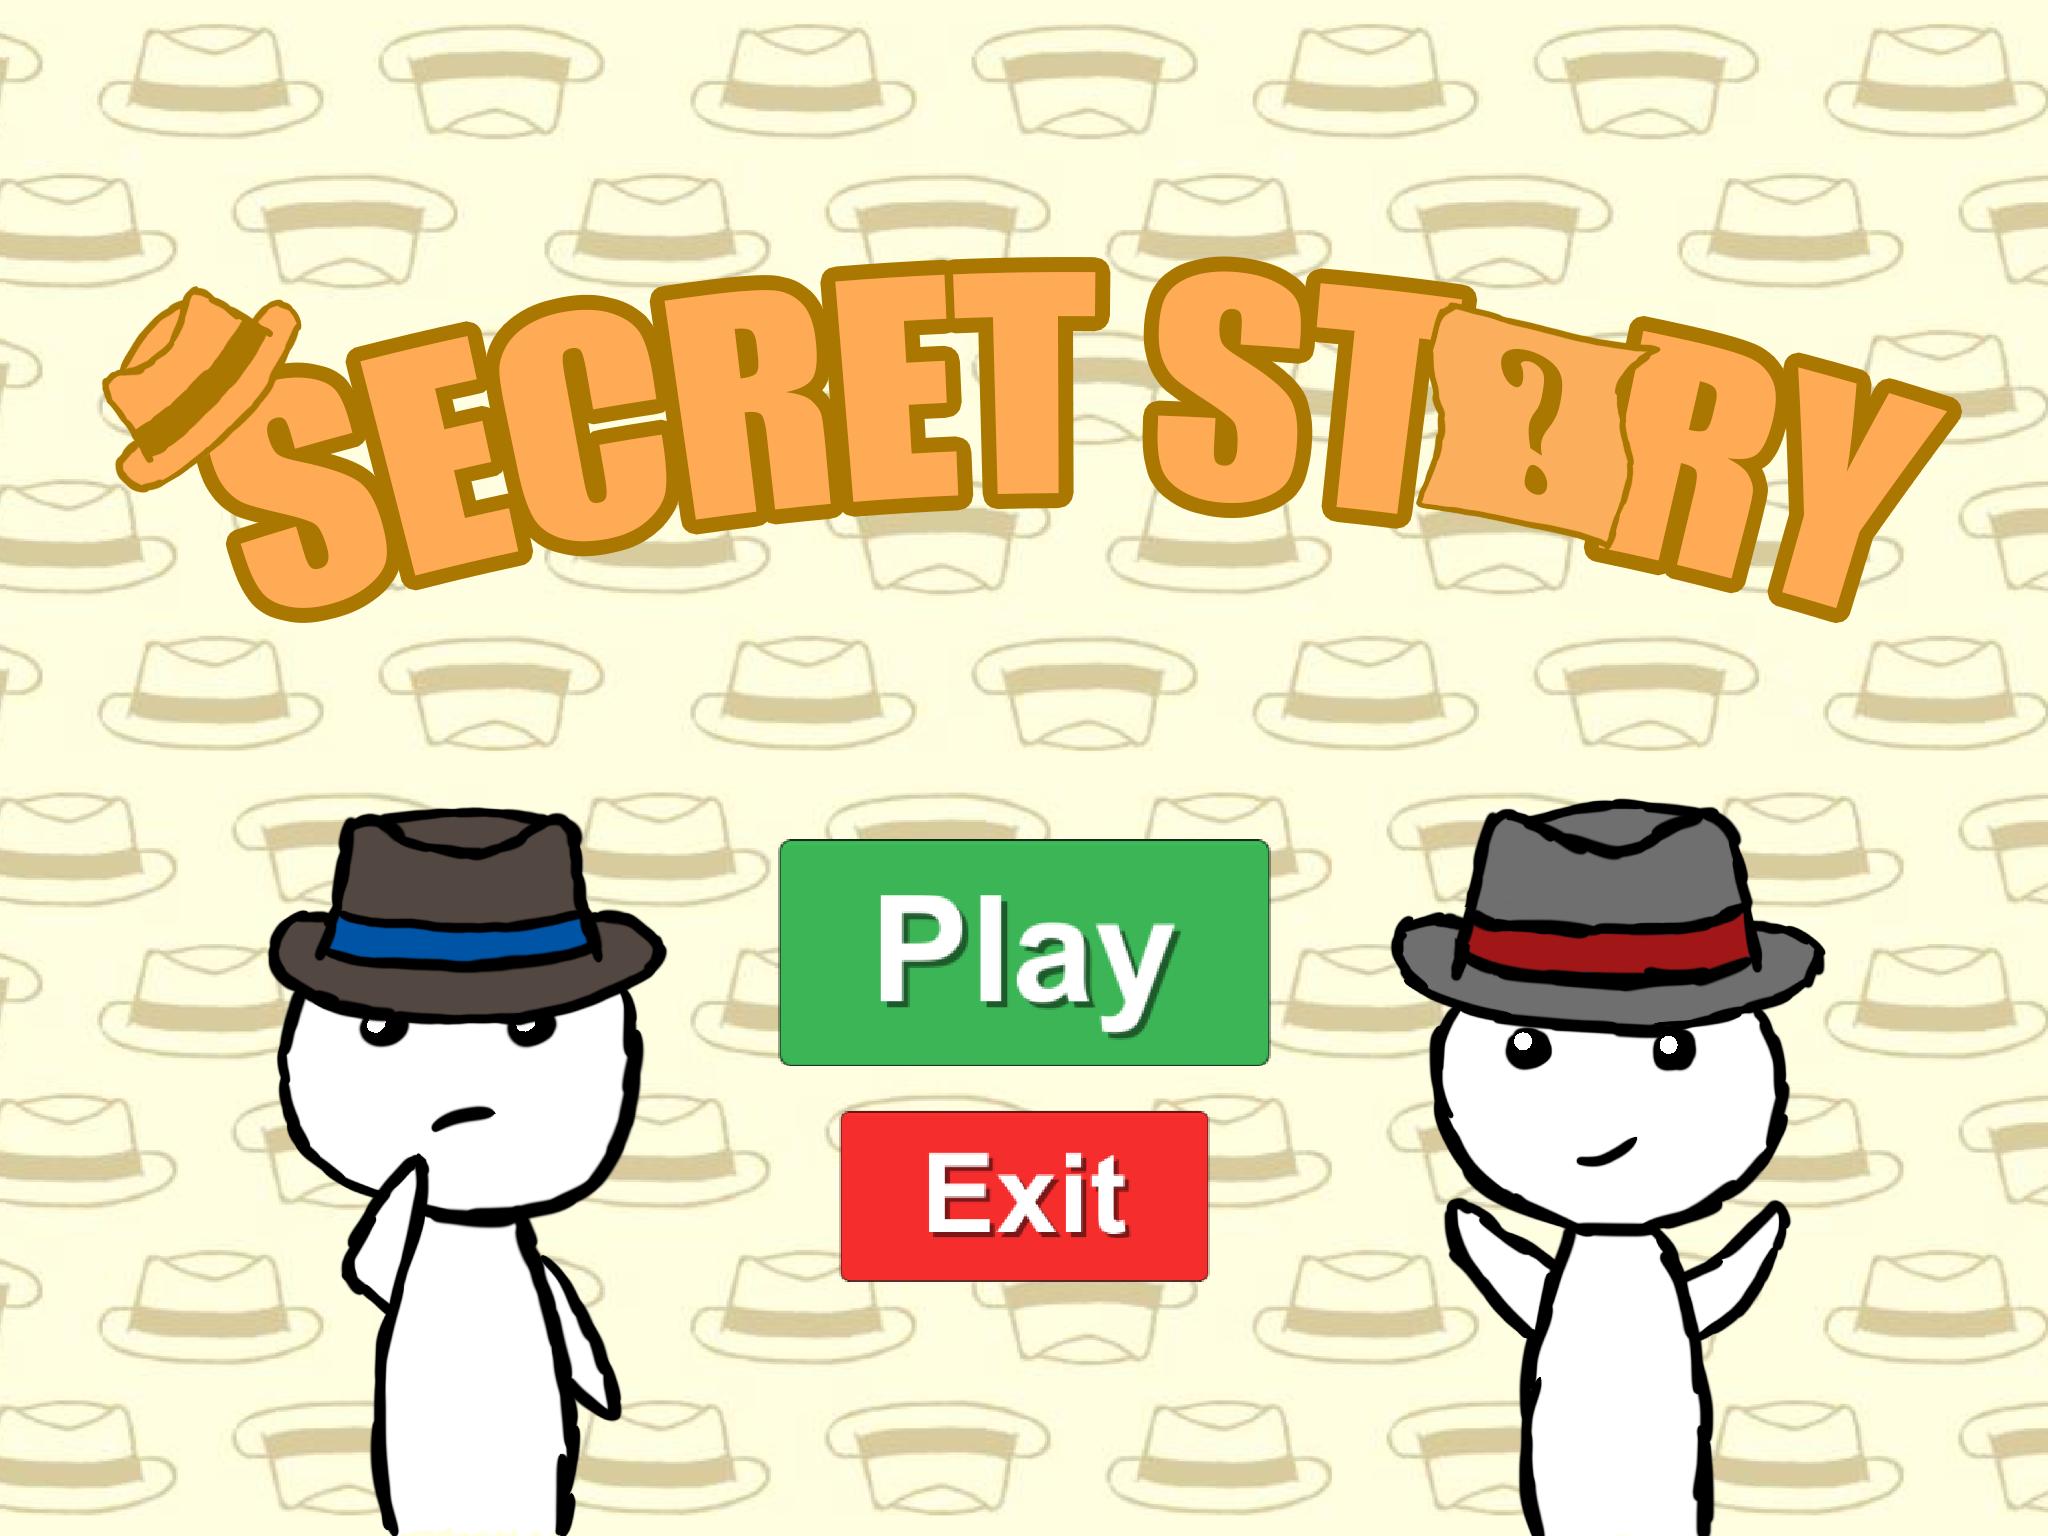 SecretStory_Image1_Title.png